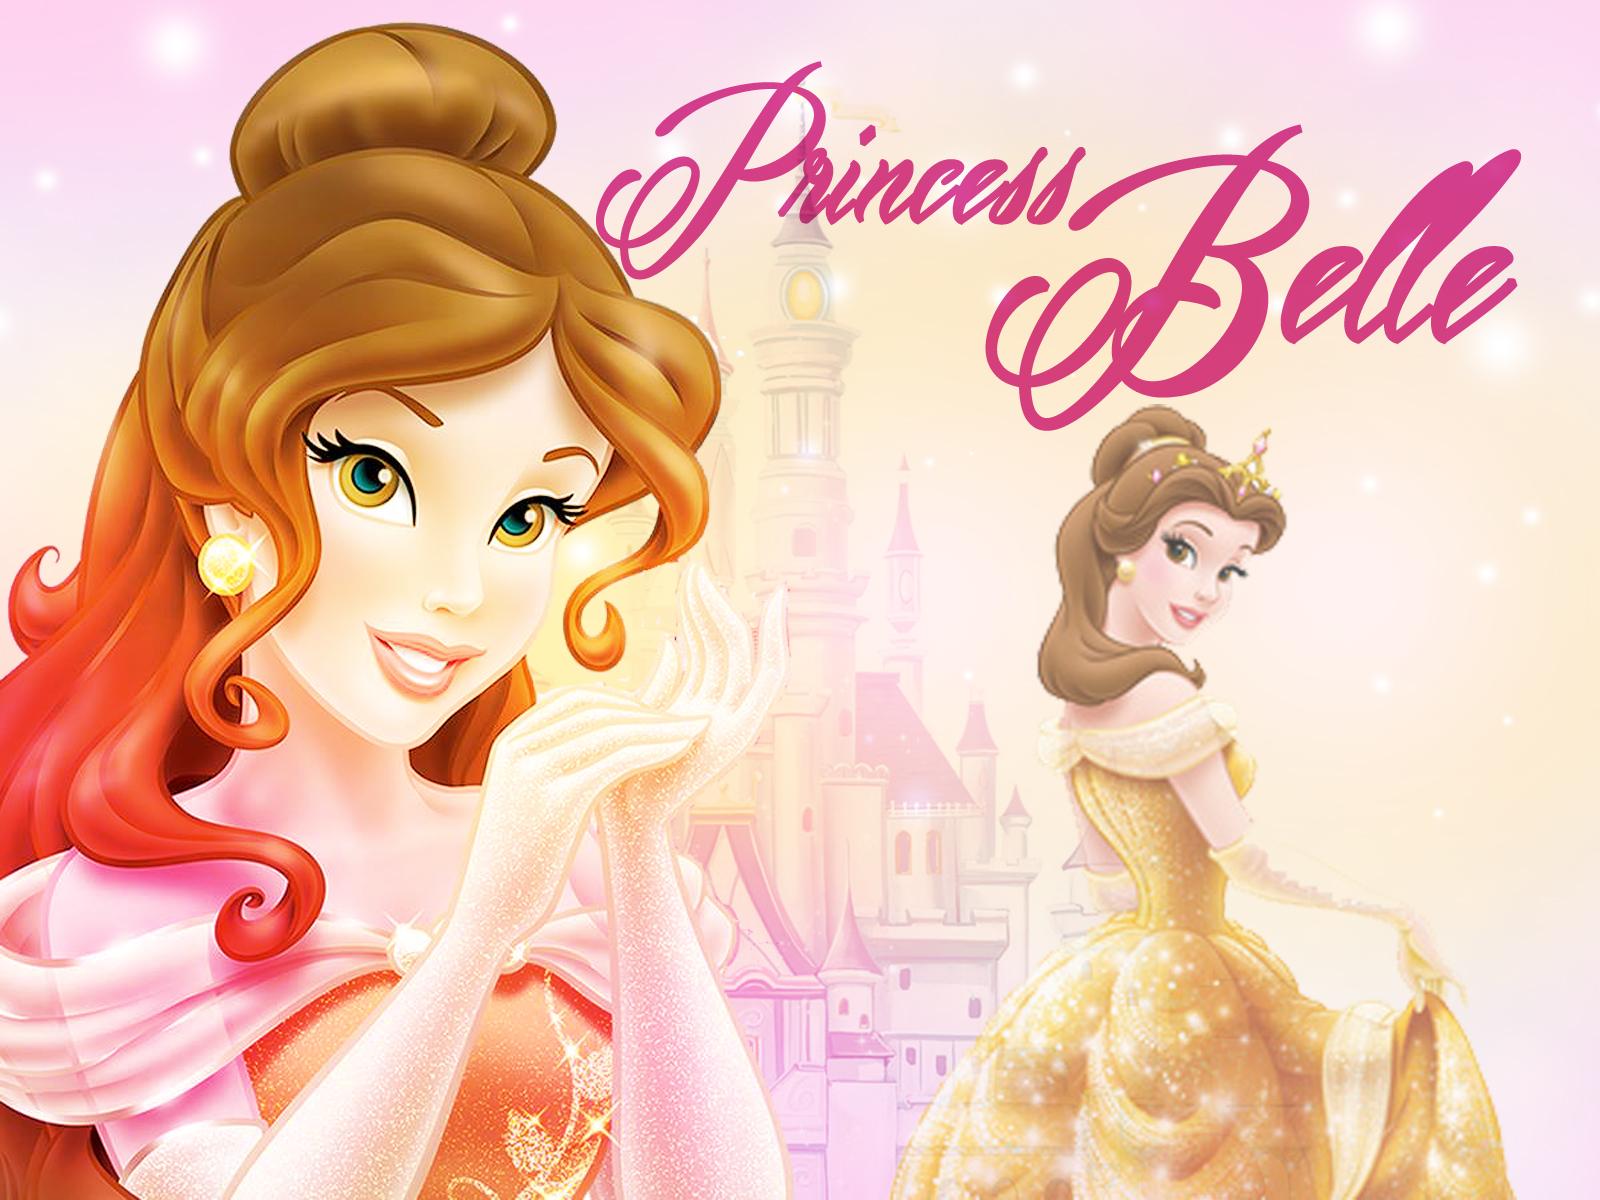 belle wallpaper disney princess wallpaper 38366056 fanpop. Black Bedroom Furniture Sets. Home Design Ideas